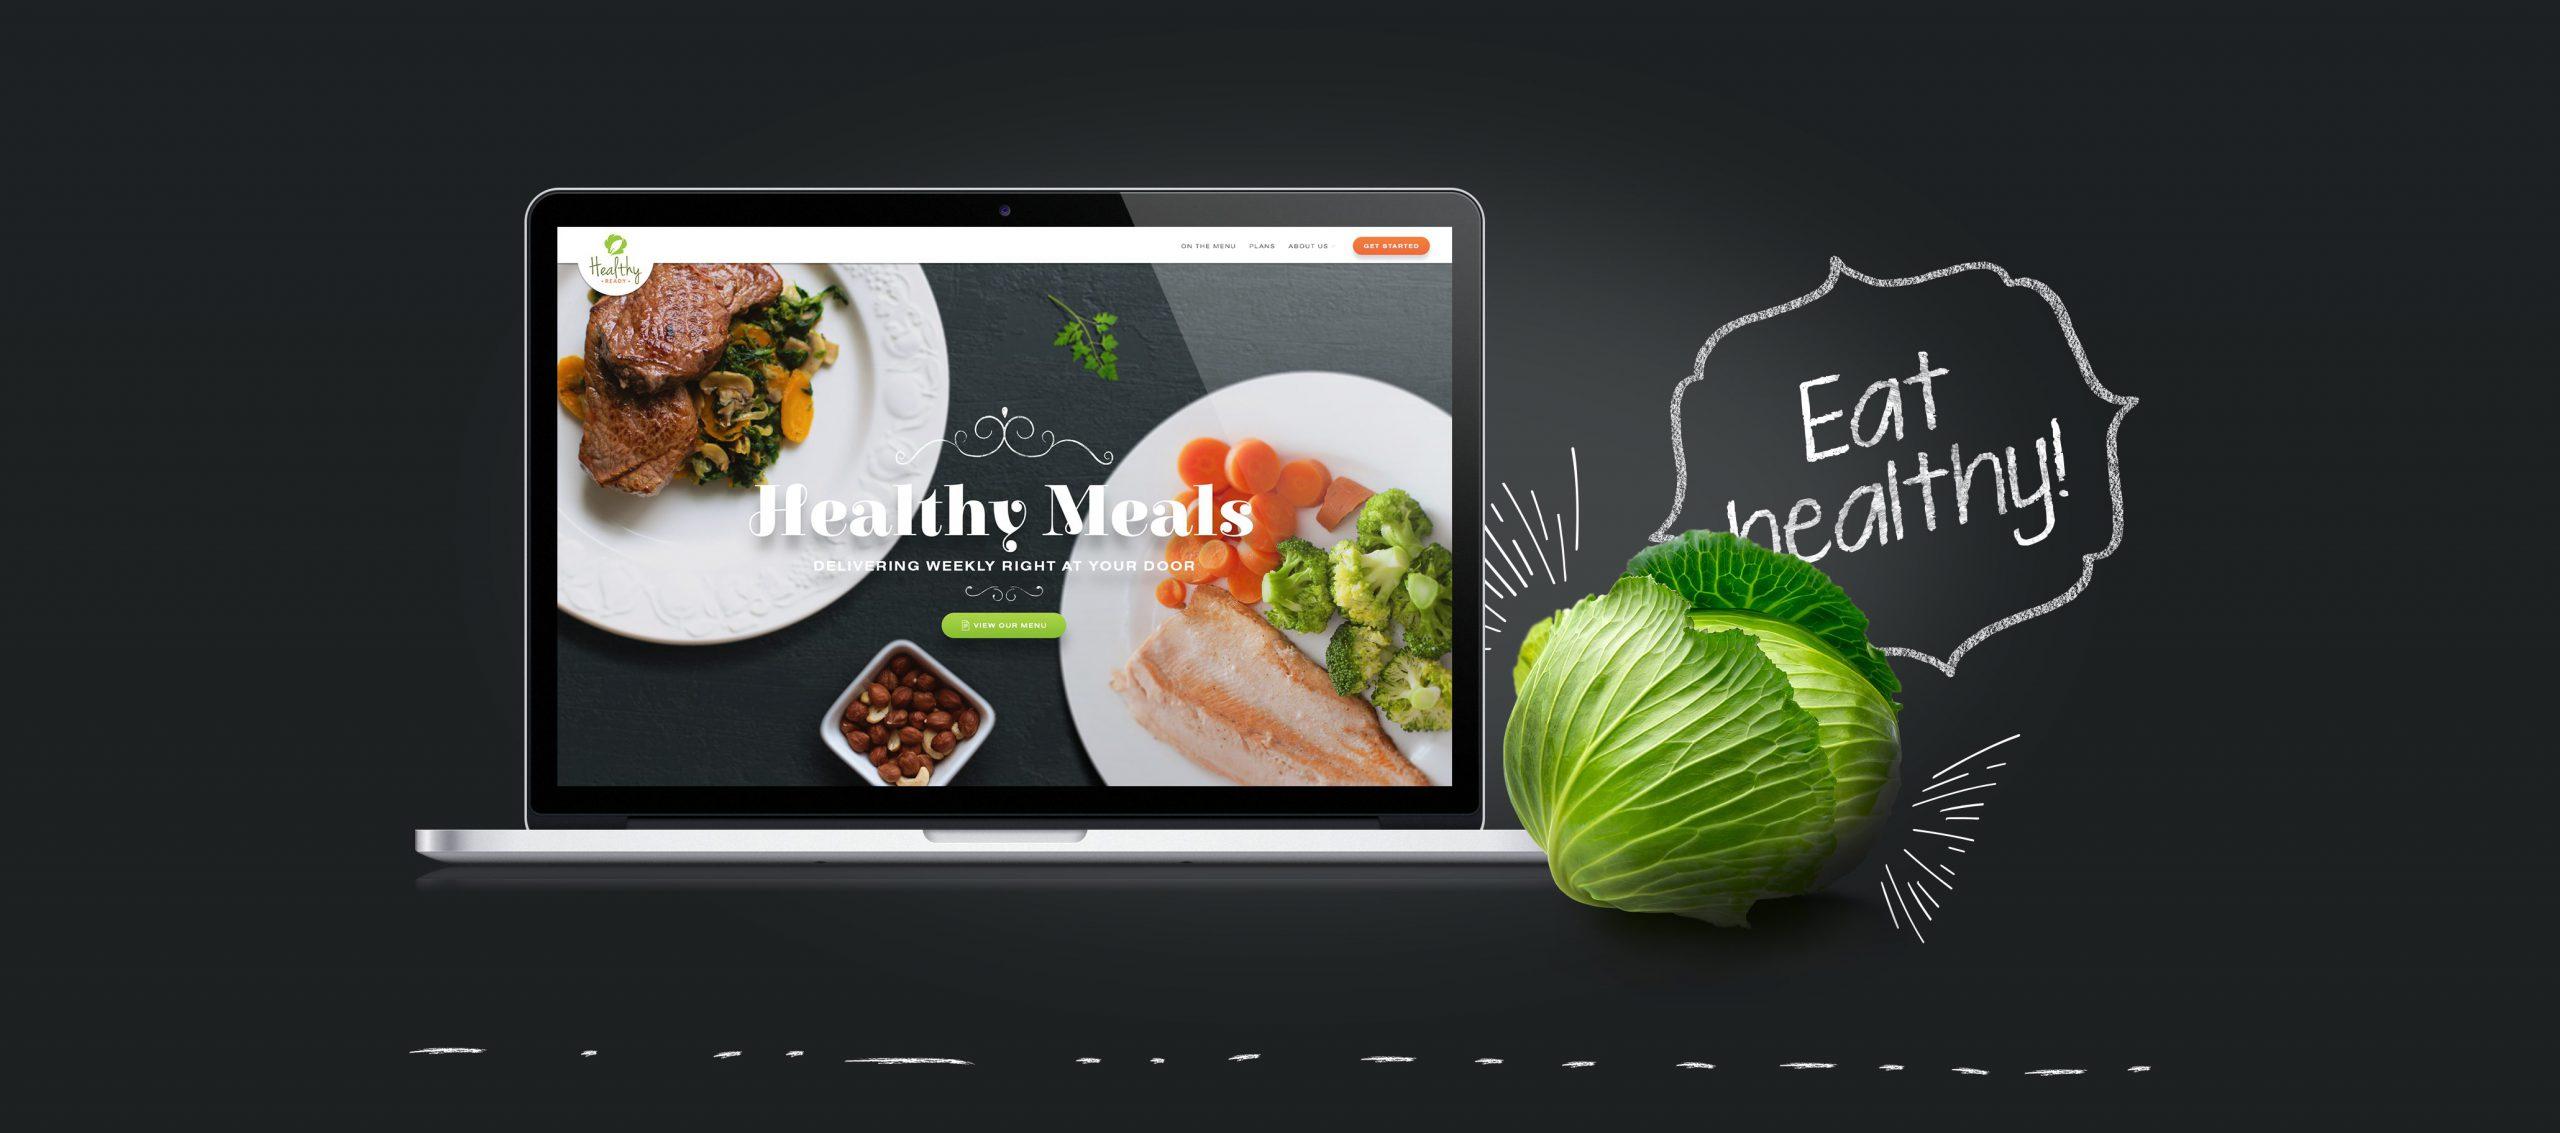 Website design for a healthy meals brand